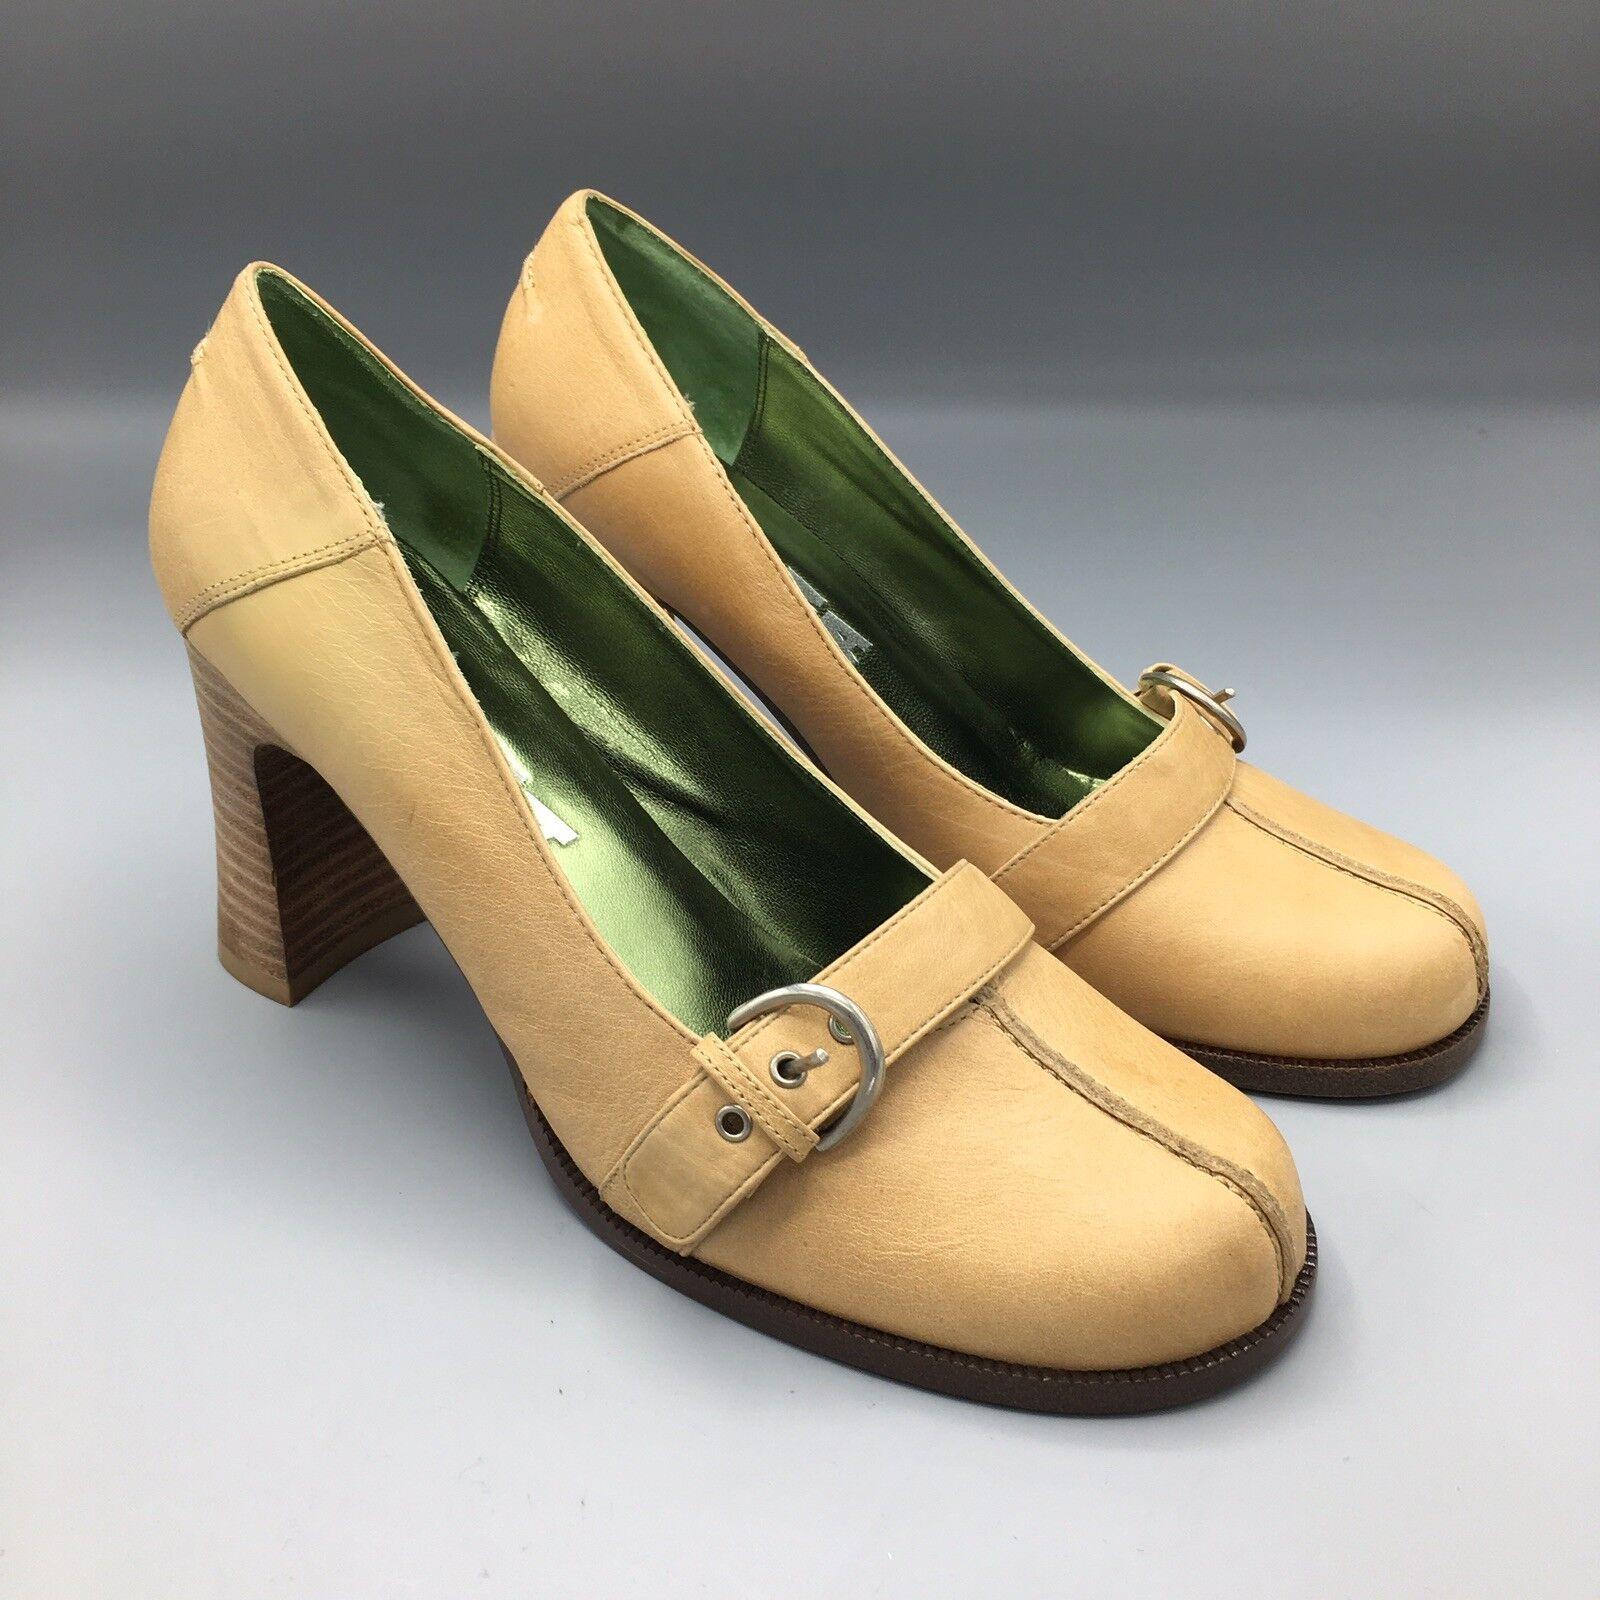 NIB NANA Dimensione 8 Tan Leather Block Heels  with Buckles  vanno a ruba